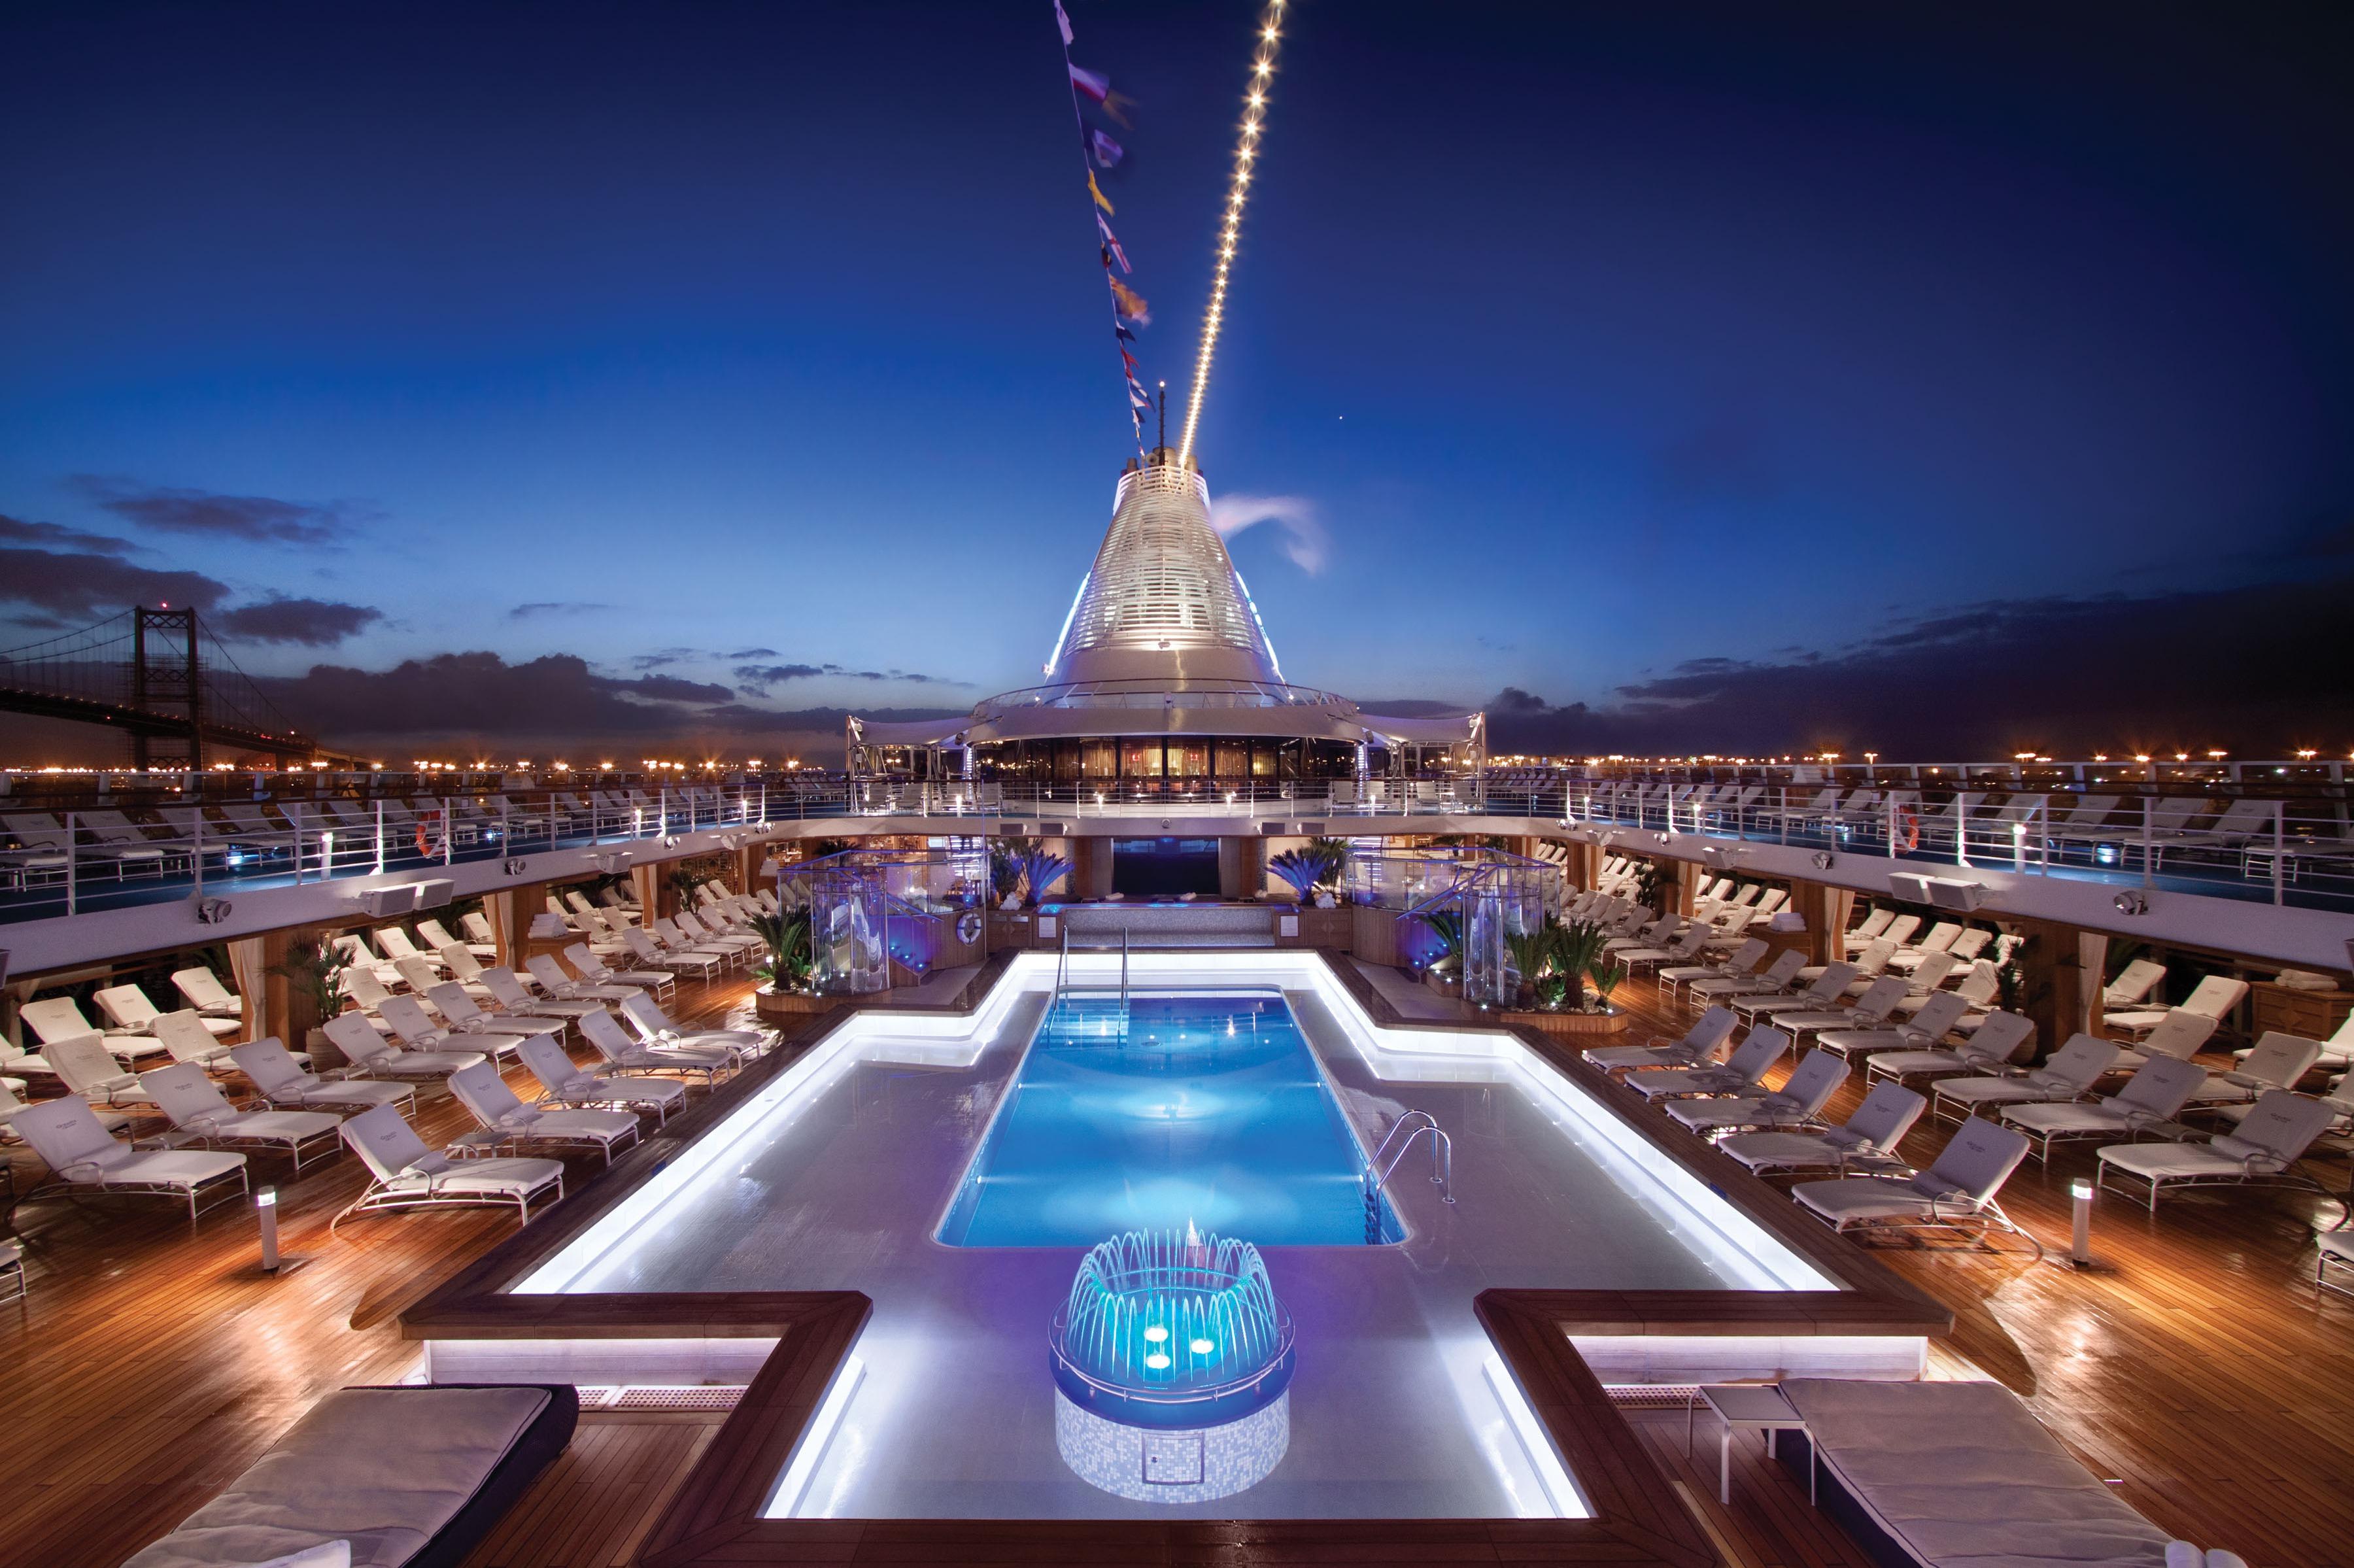 Marina and Riviera Pool Deck